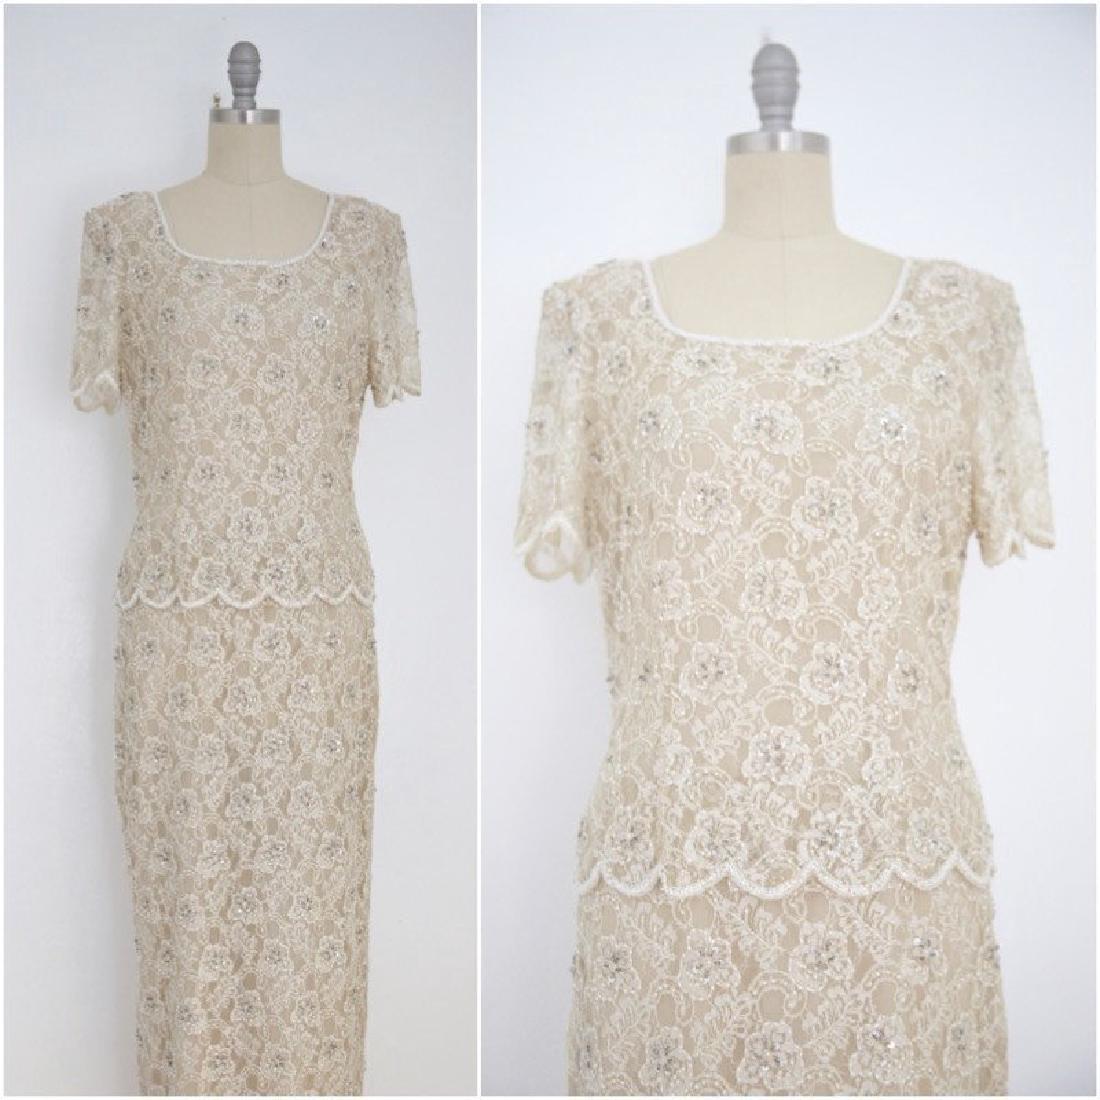 Vintage 1960s Beige Lace Floral Beaded Dress